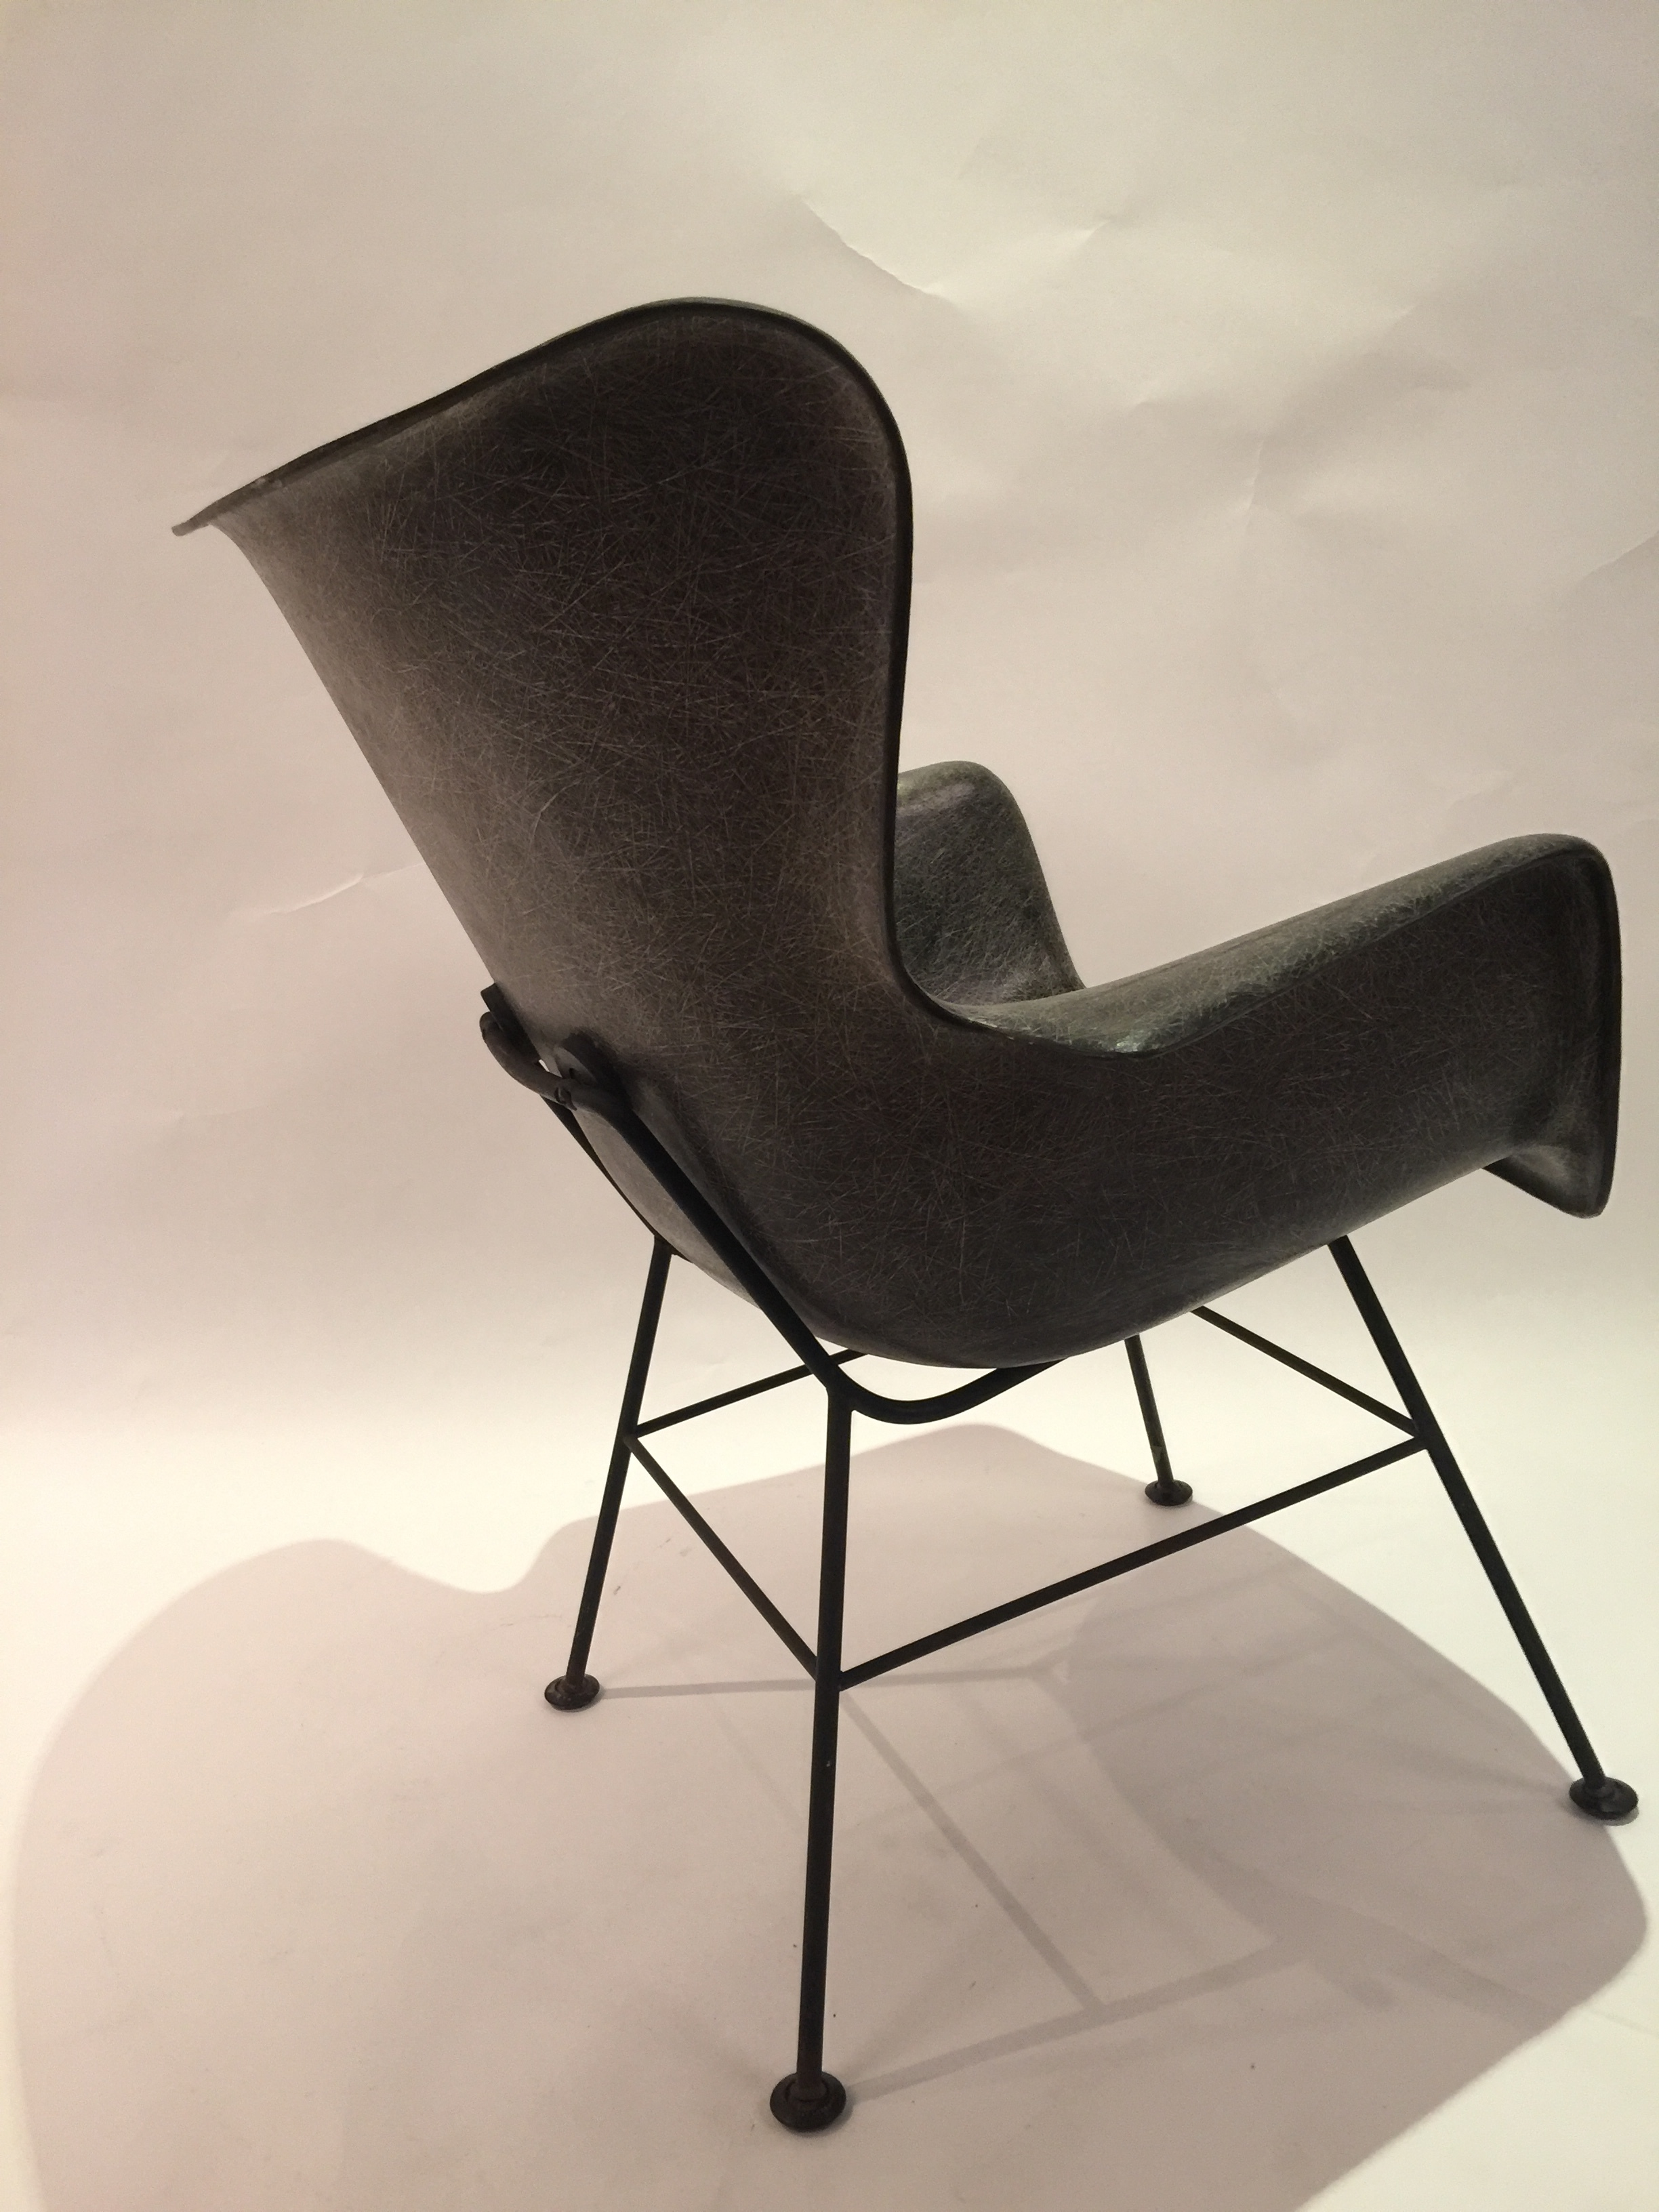 Laurence Peabody for Selig - Wingback chair 10.JPG